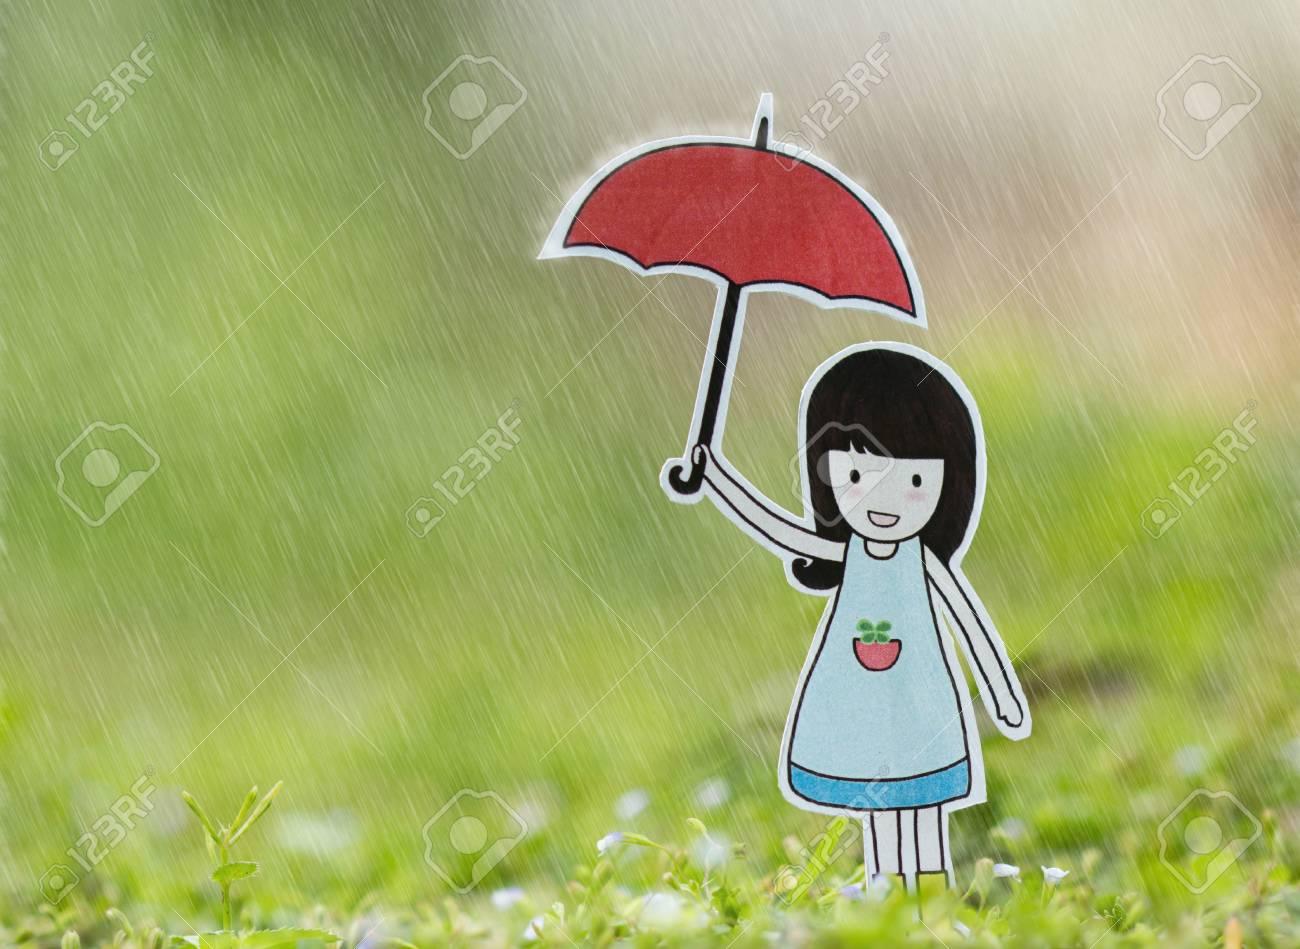 e472b7963bb Girl on the rain with red umbrella Stock Photo - 42649150